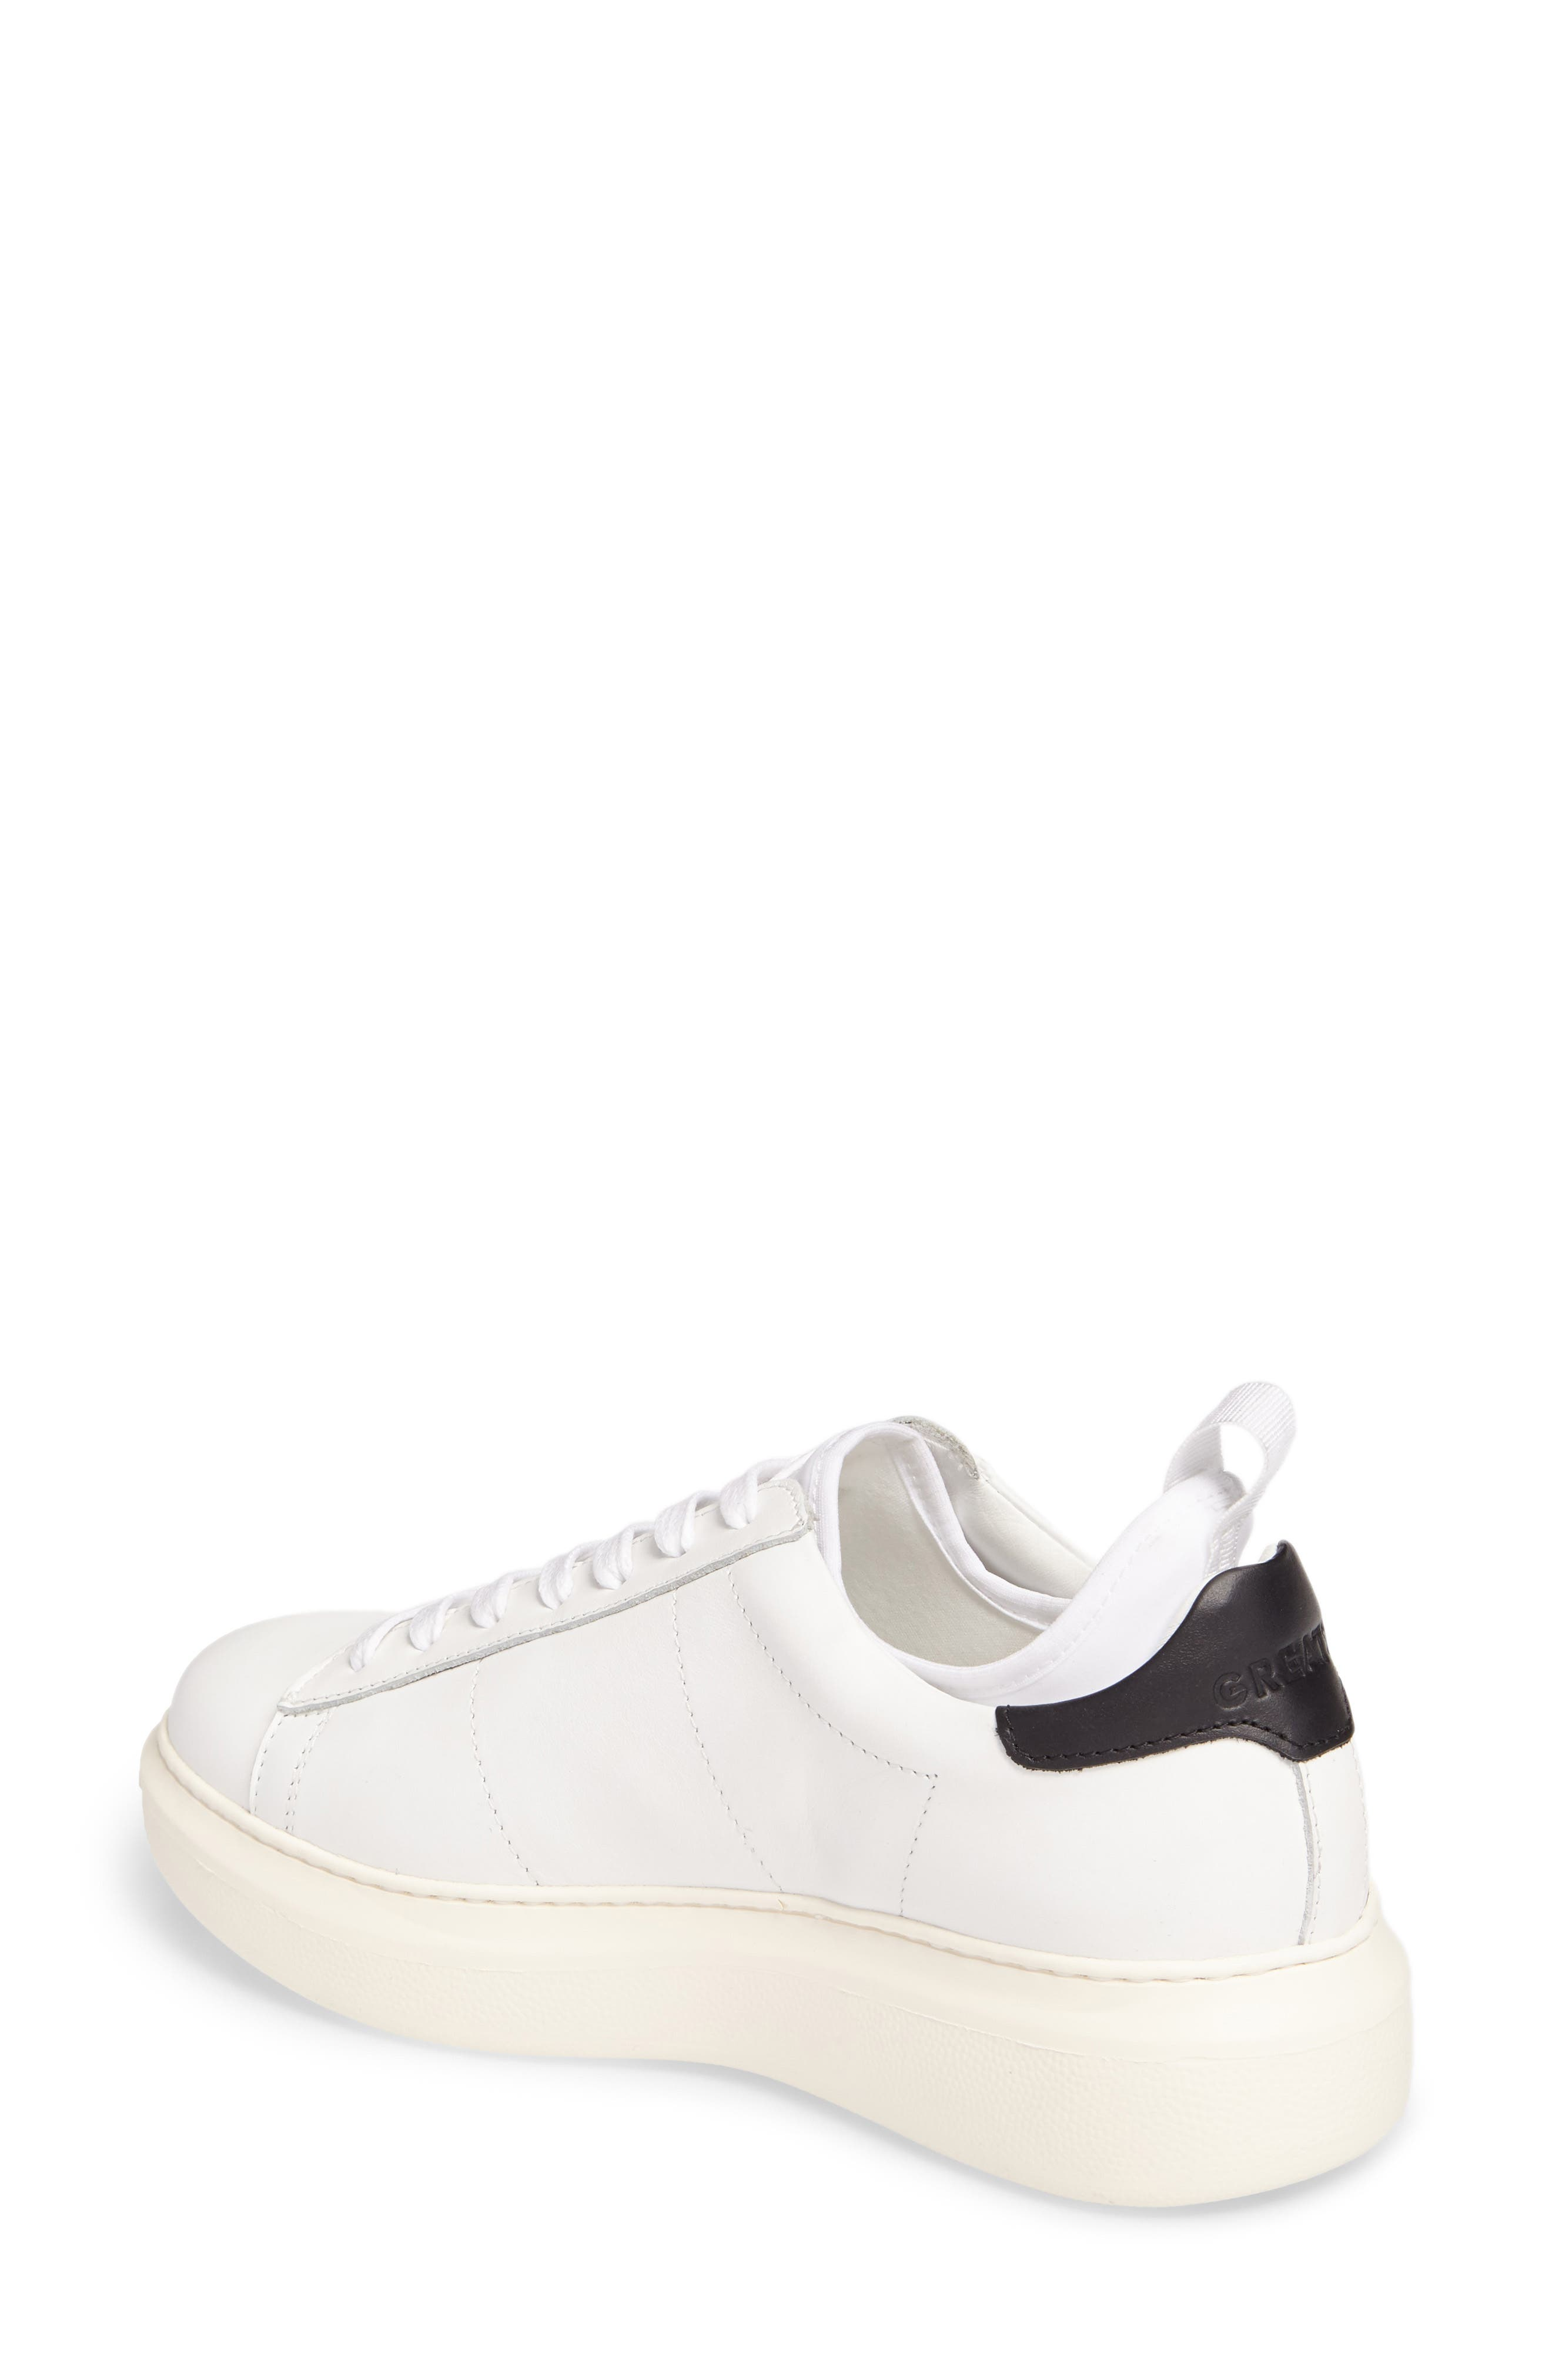 Alternate Image 2  - Greats Alta Low Top Sneaker (Women)